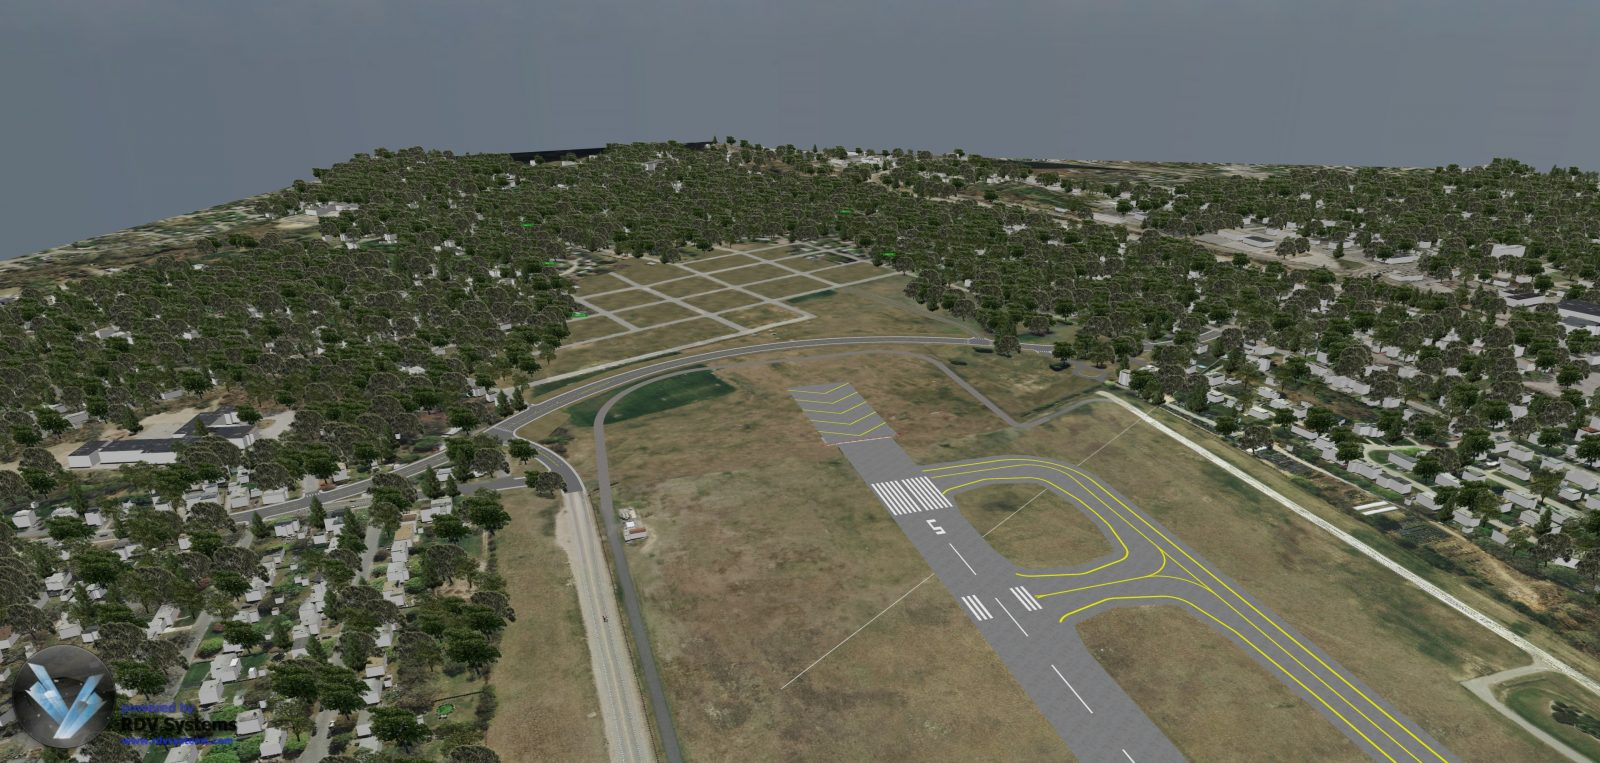 RDV Systems - TF Green Airport 4